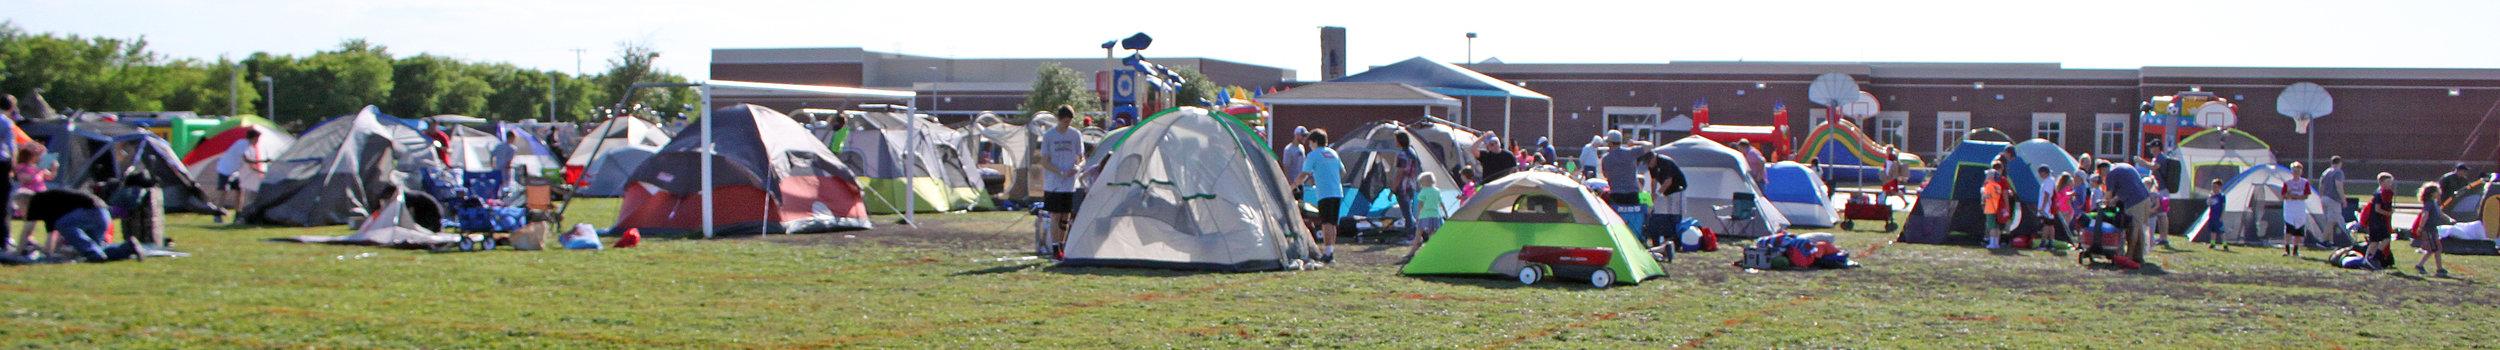 puster tents.jpg